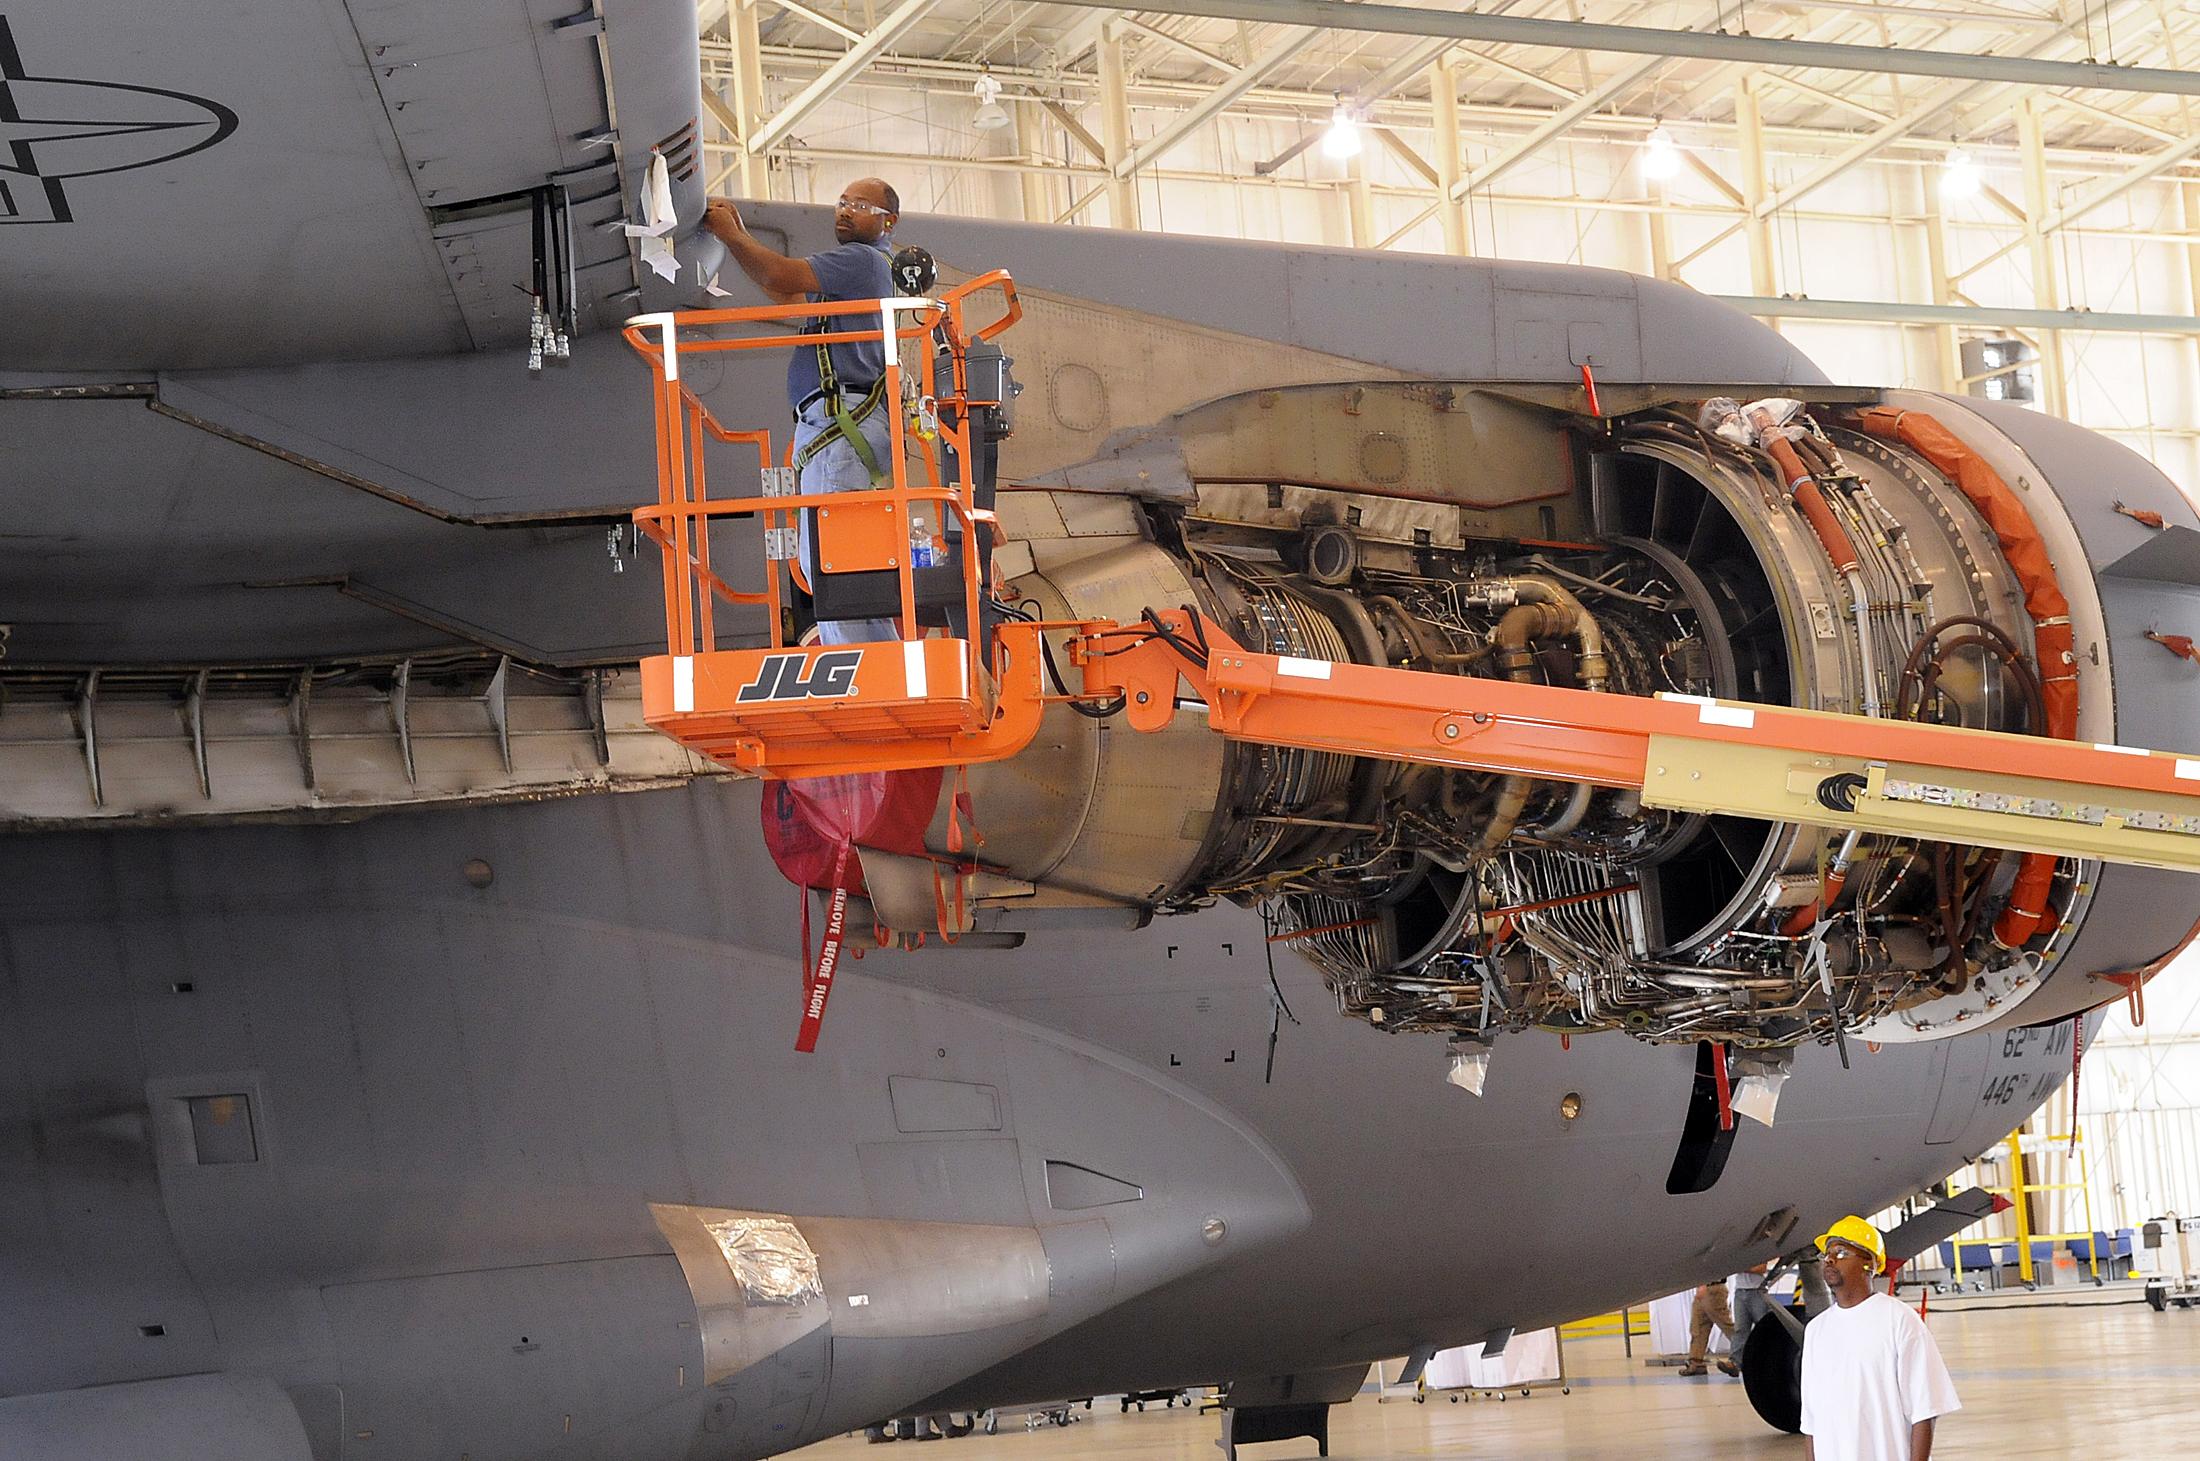 iii receives maintenance - photo #25